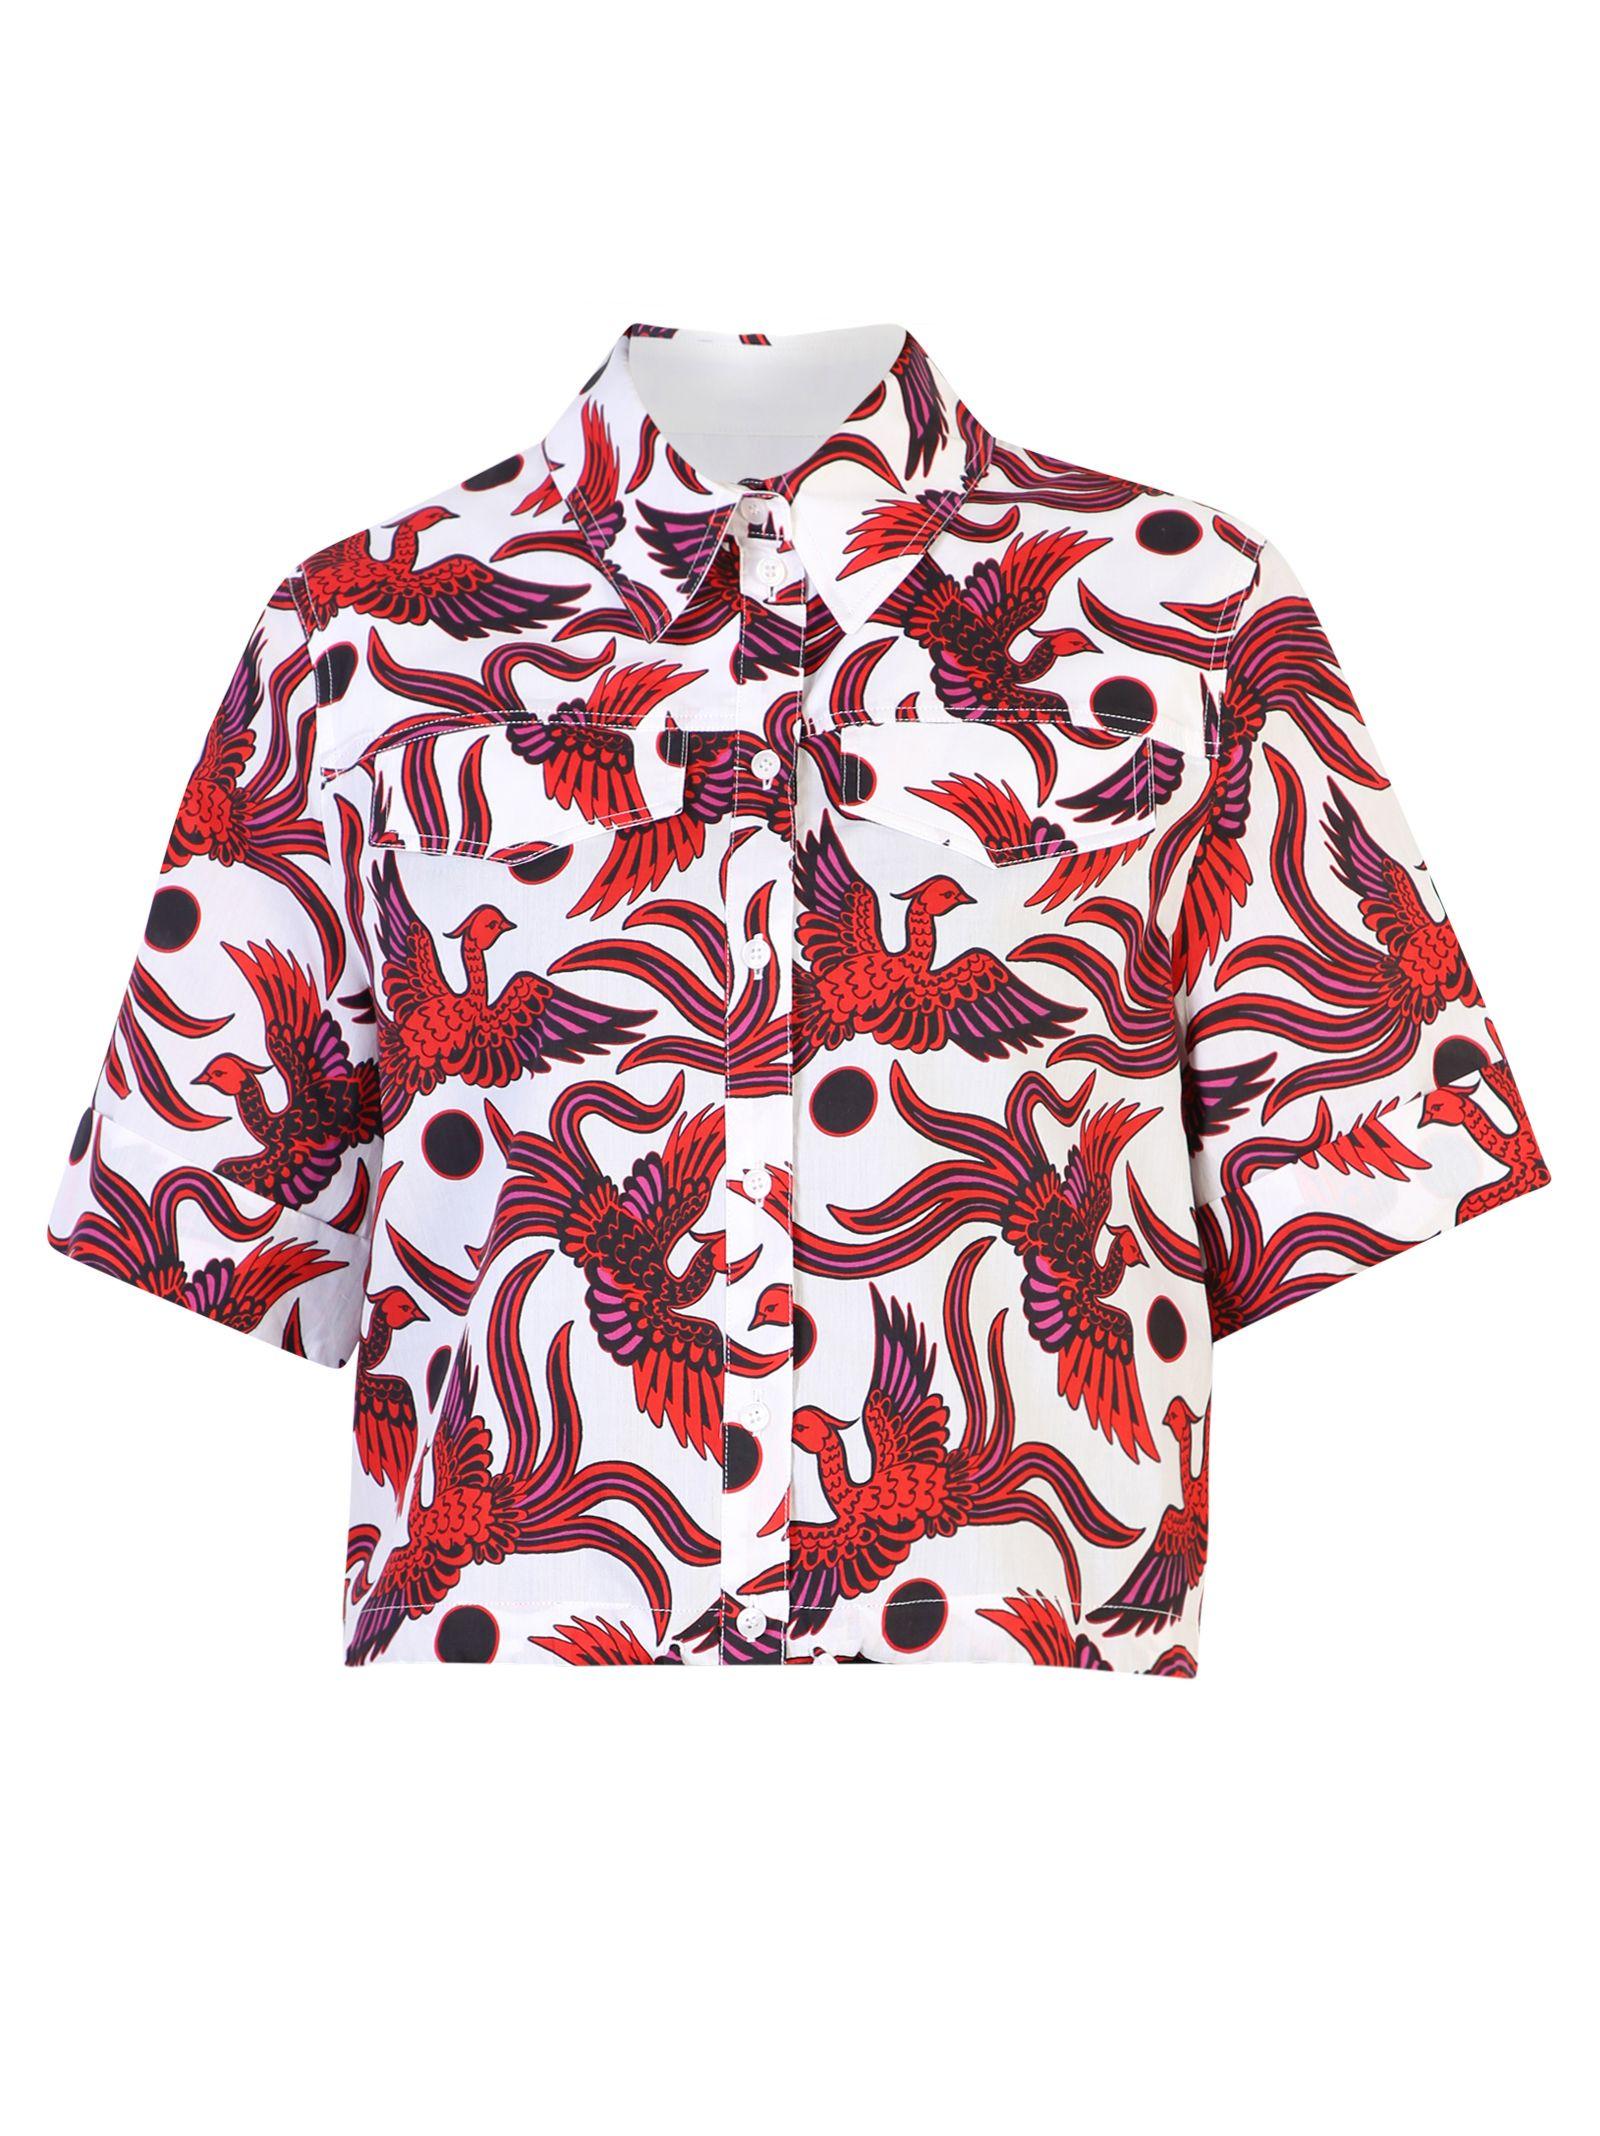 Kenzo Printed Shirt